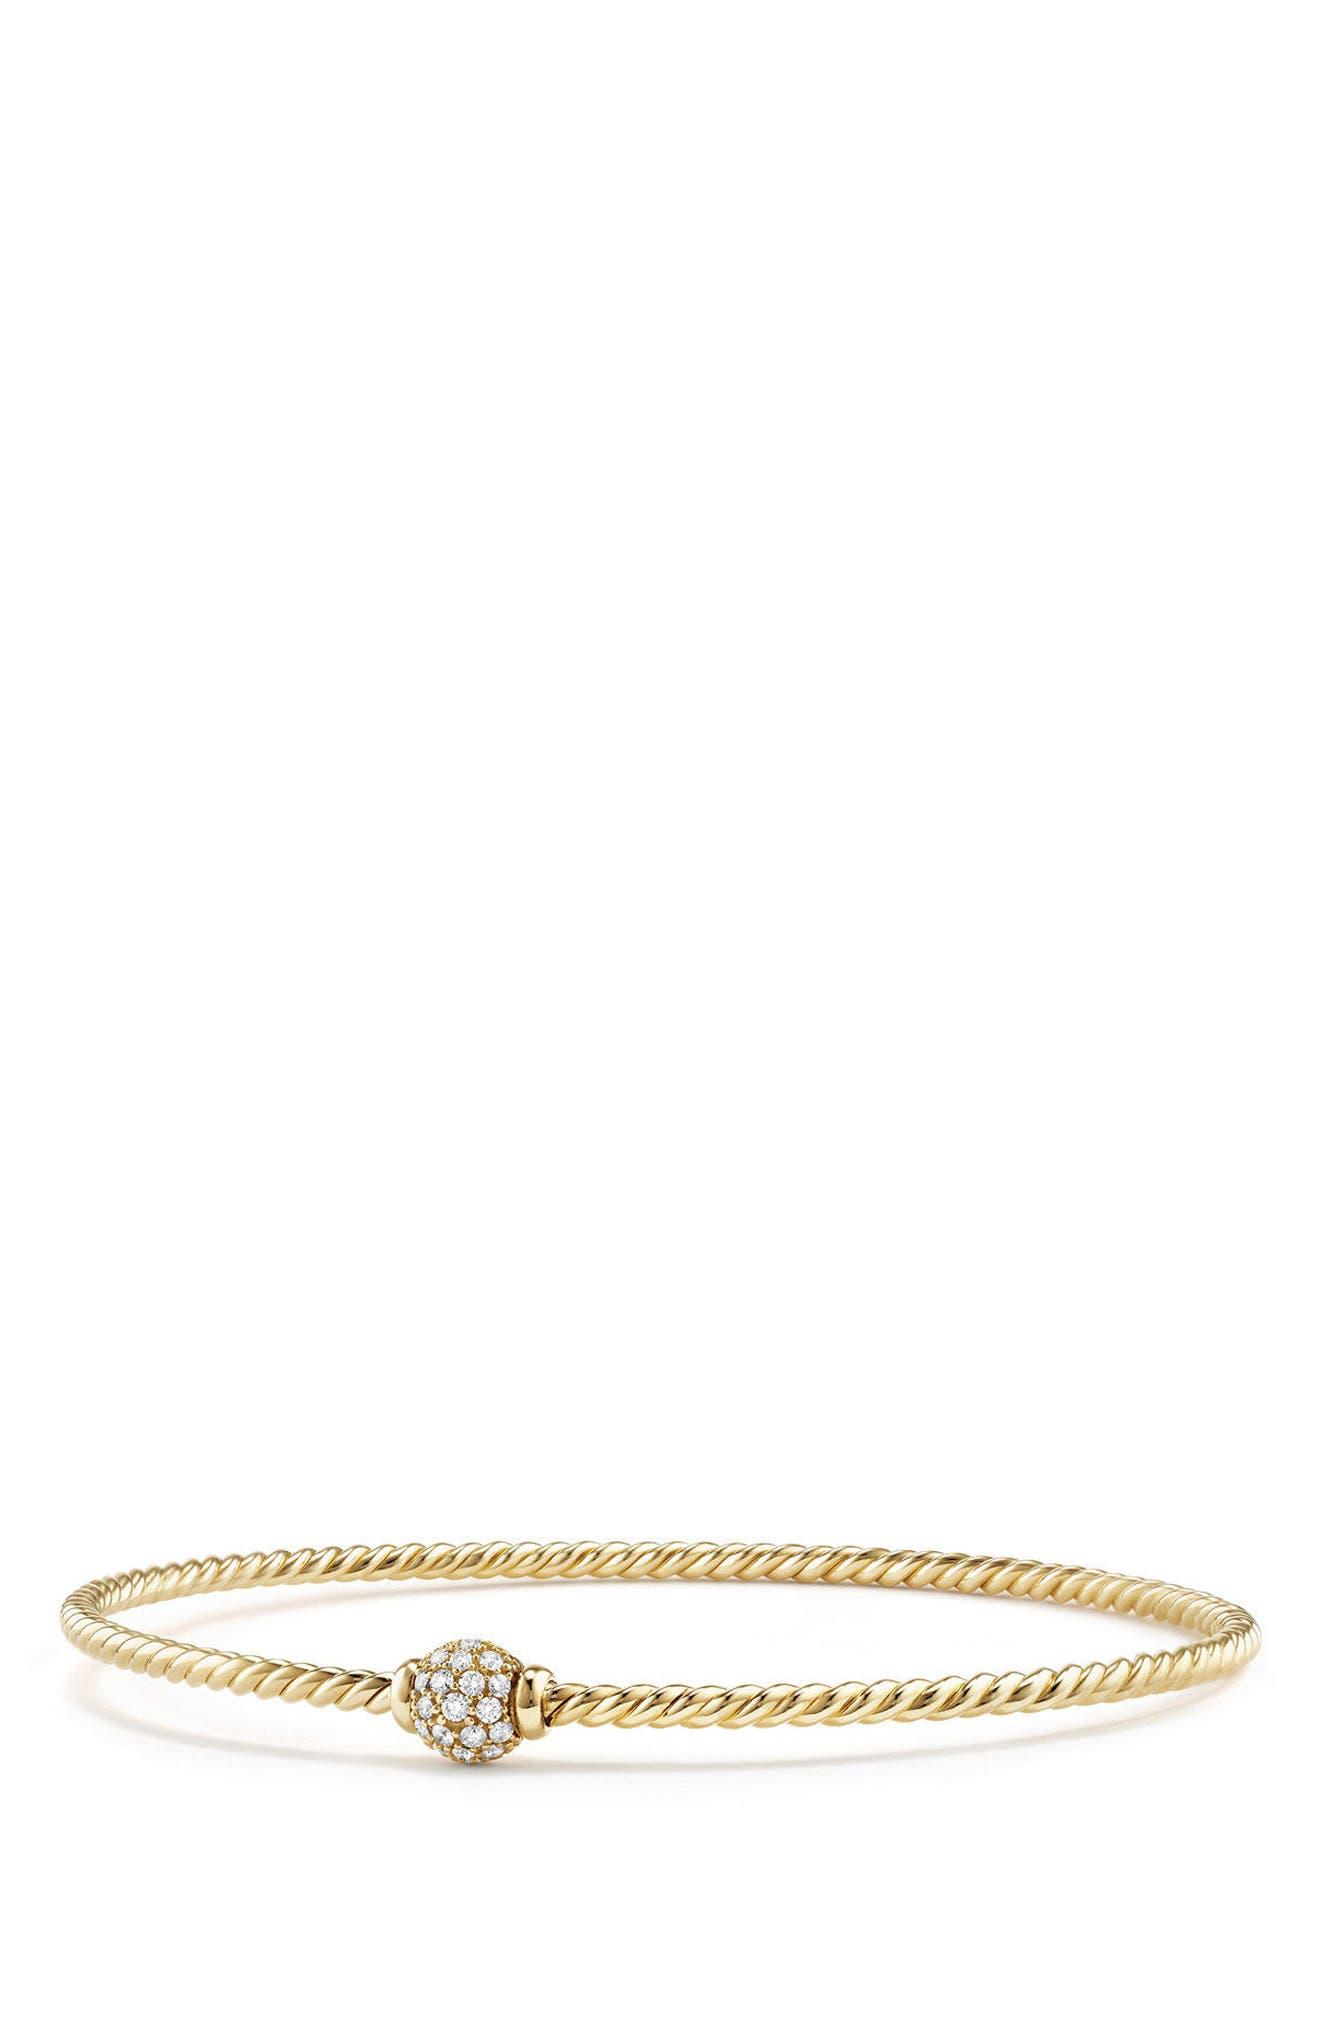 Solari Station Pavé Bracelet with Diamonds in 18K Gold,                         Main,                         color, YELLOW GOLD/ DIAMOND